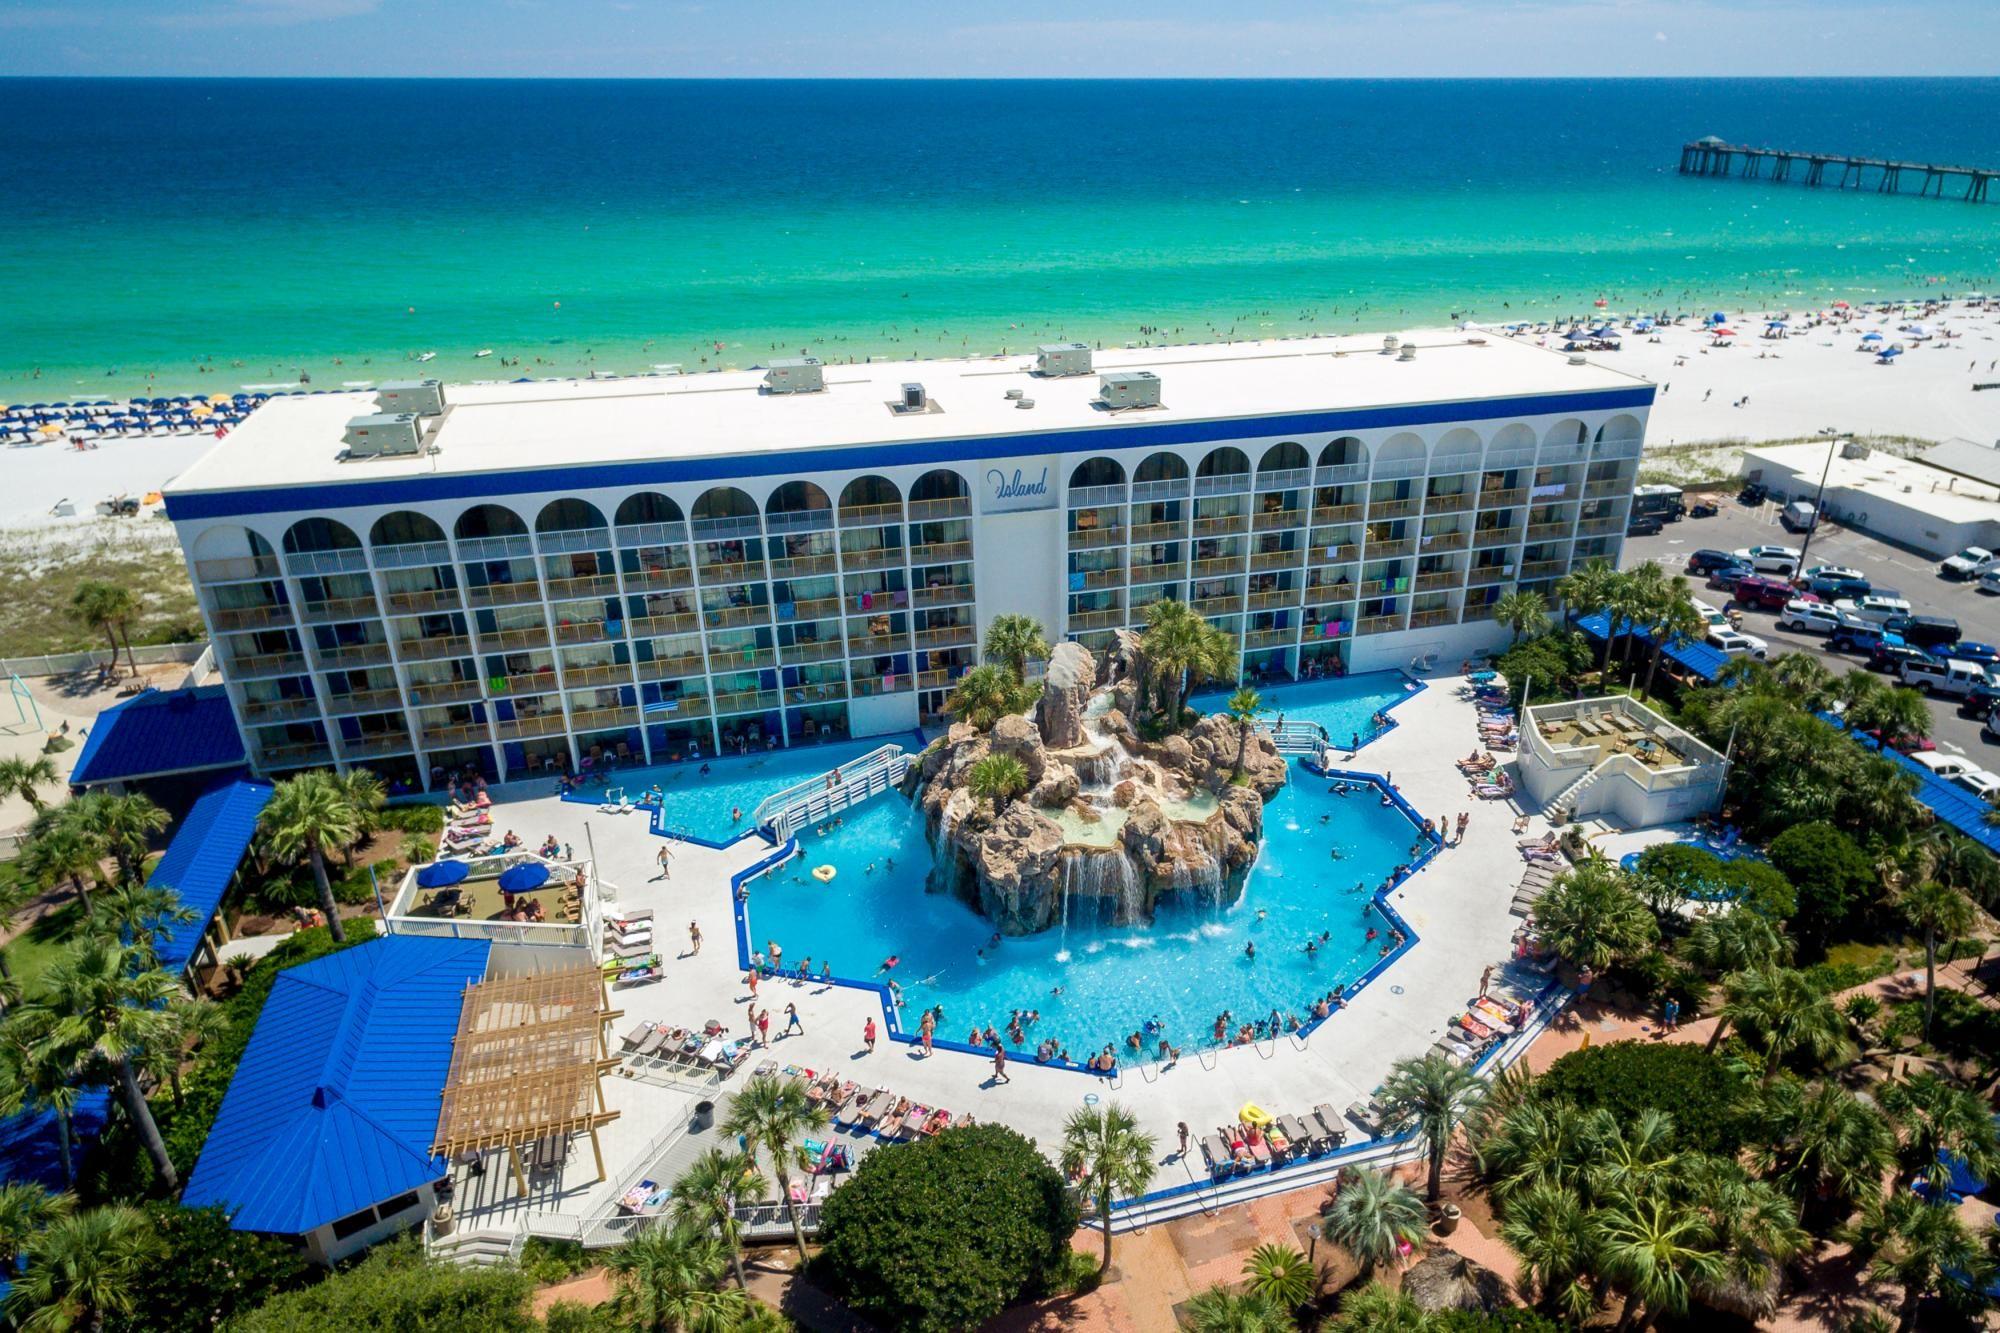 The Island Ft Walton Destin By Hotel Rl Hotel In Fort Walton Fl 32548 Red Lion Hotels Florida Hotels Best Resorts Beachfront Hotels